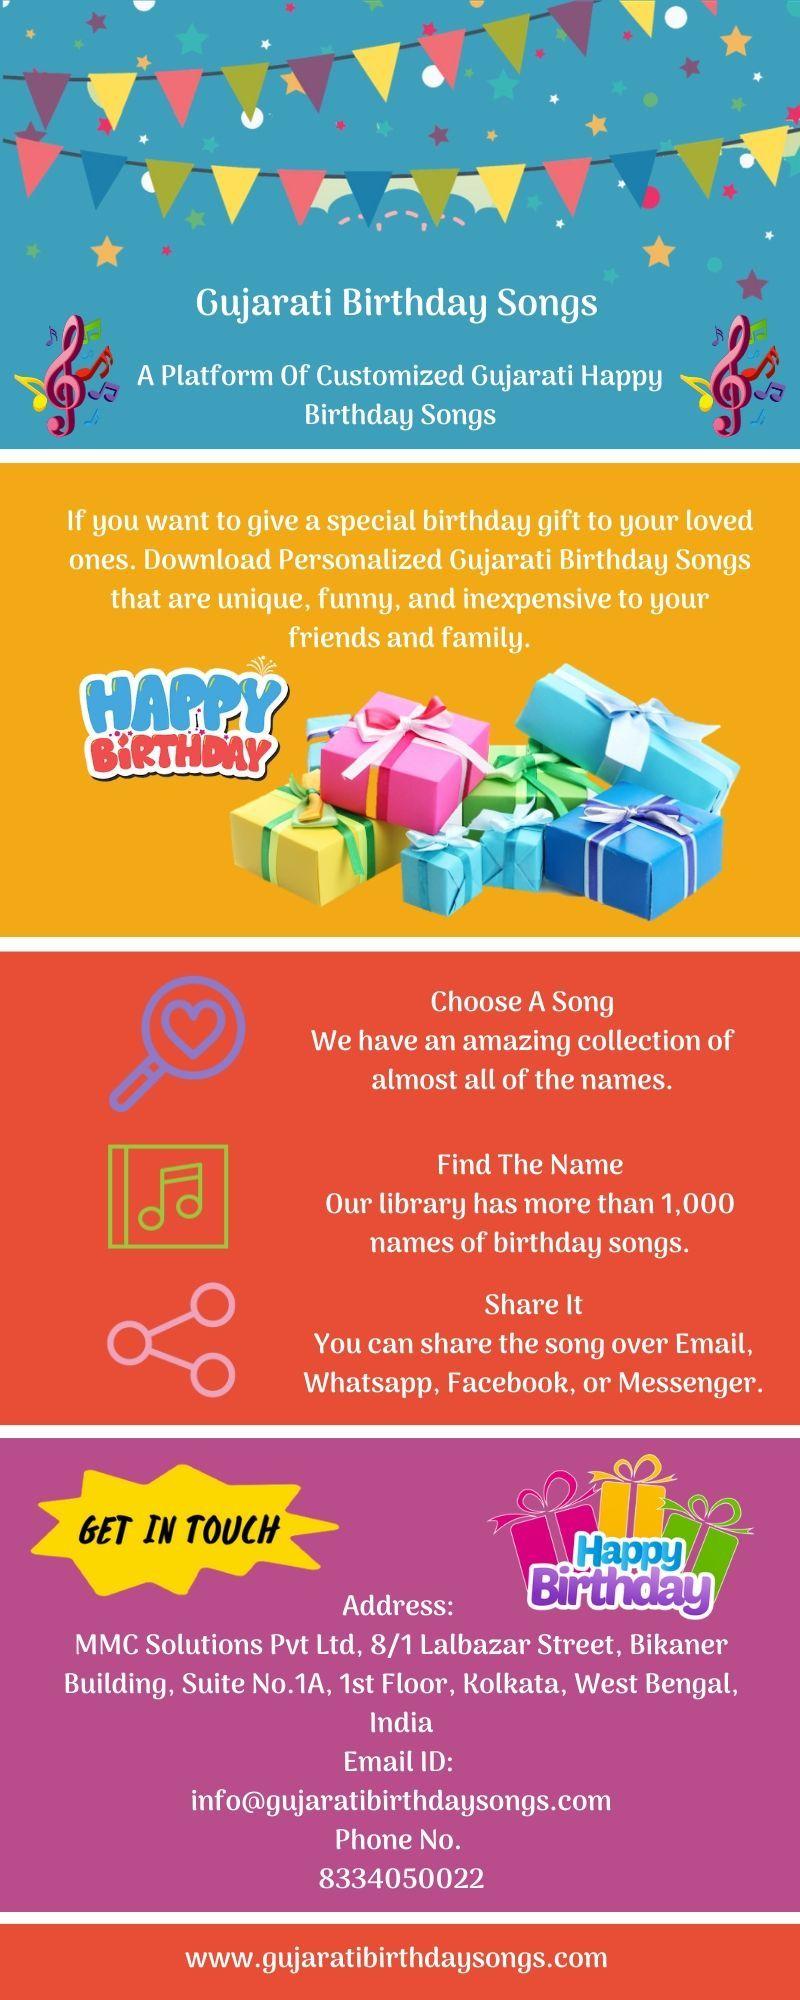 Gujarati Birthday Songs in 2020 Birthday songs, Happy